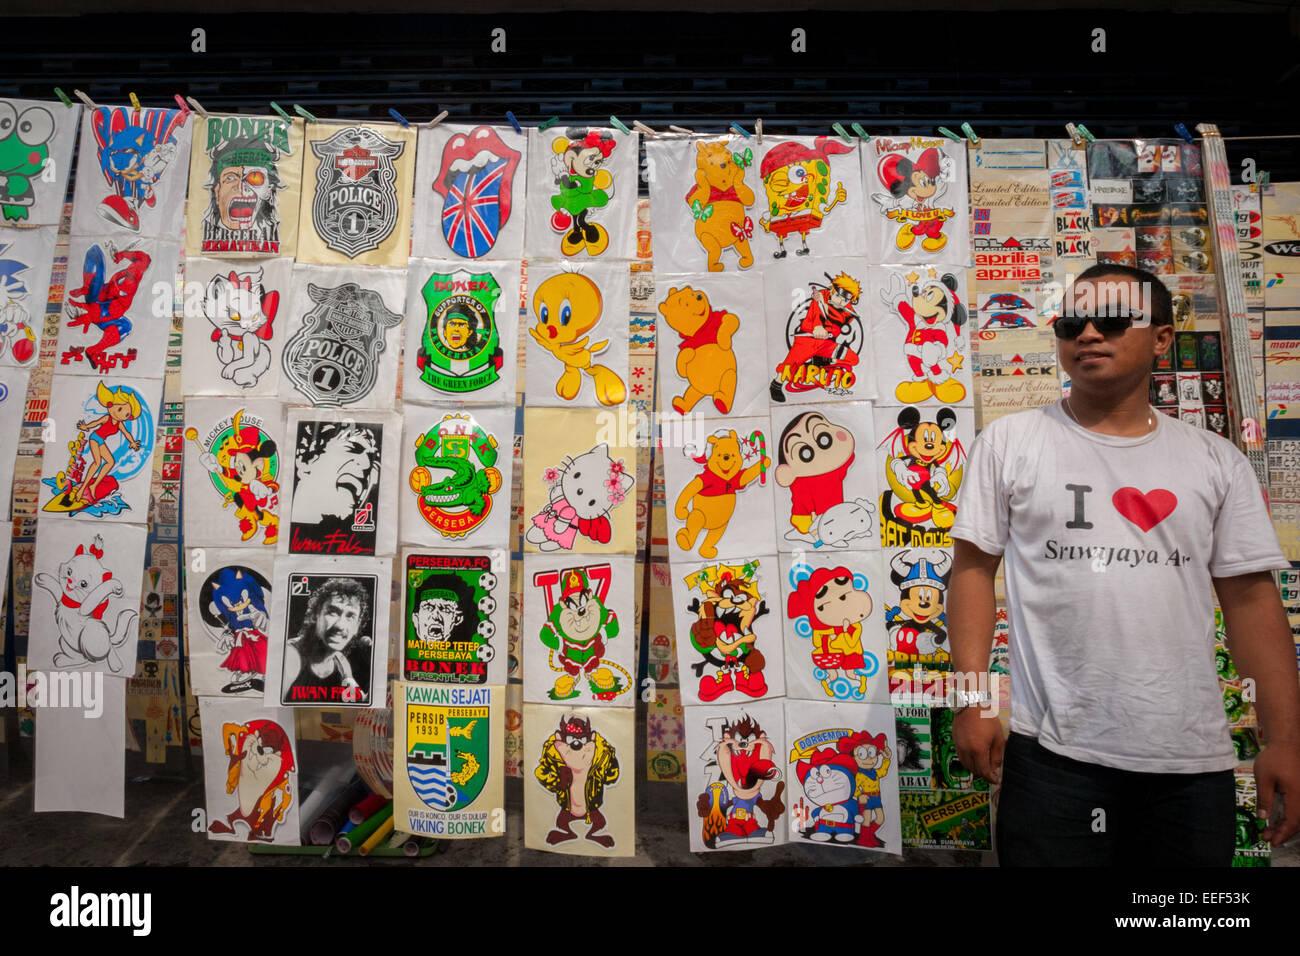 Unofficial fictional character stickers vendor at Surabaya Sunday market near Tugu Pahlawan (heroes monument). - Stock Image